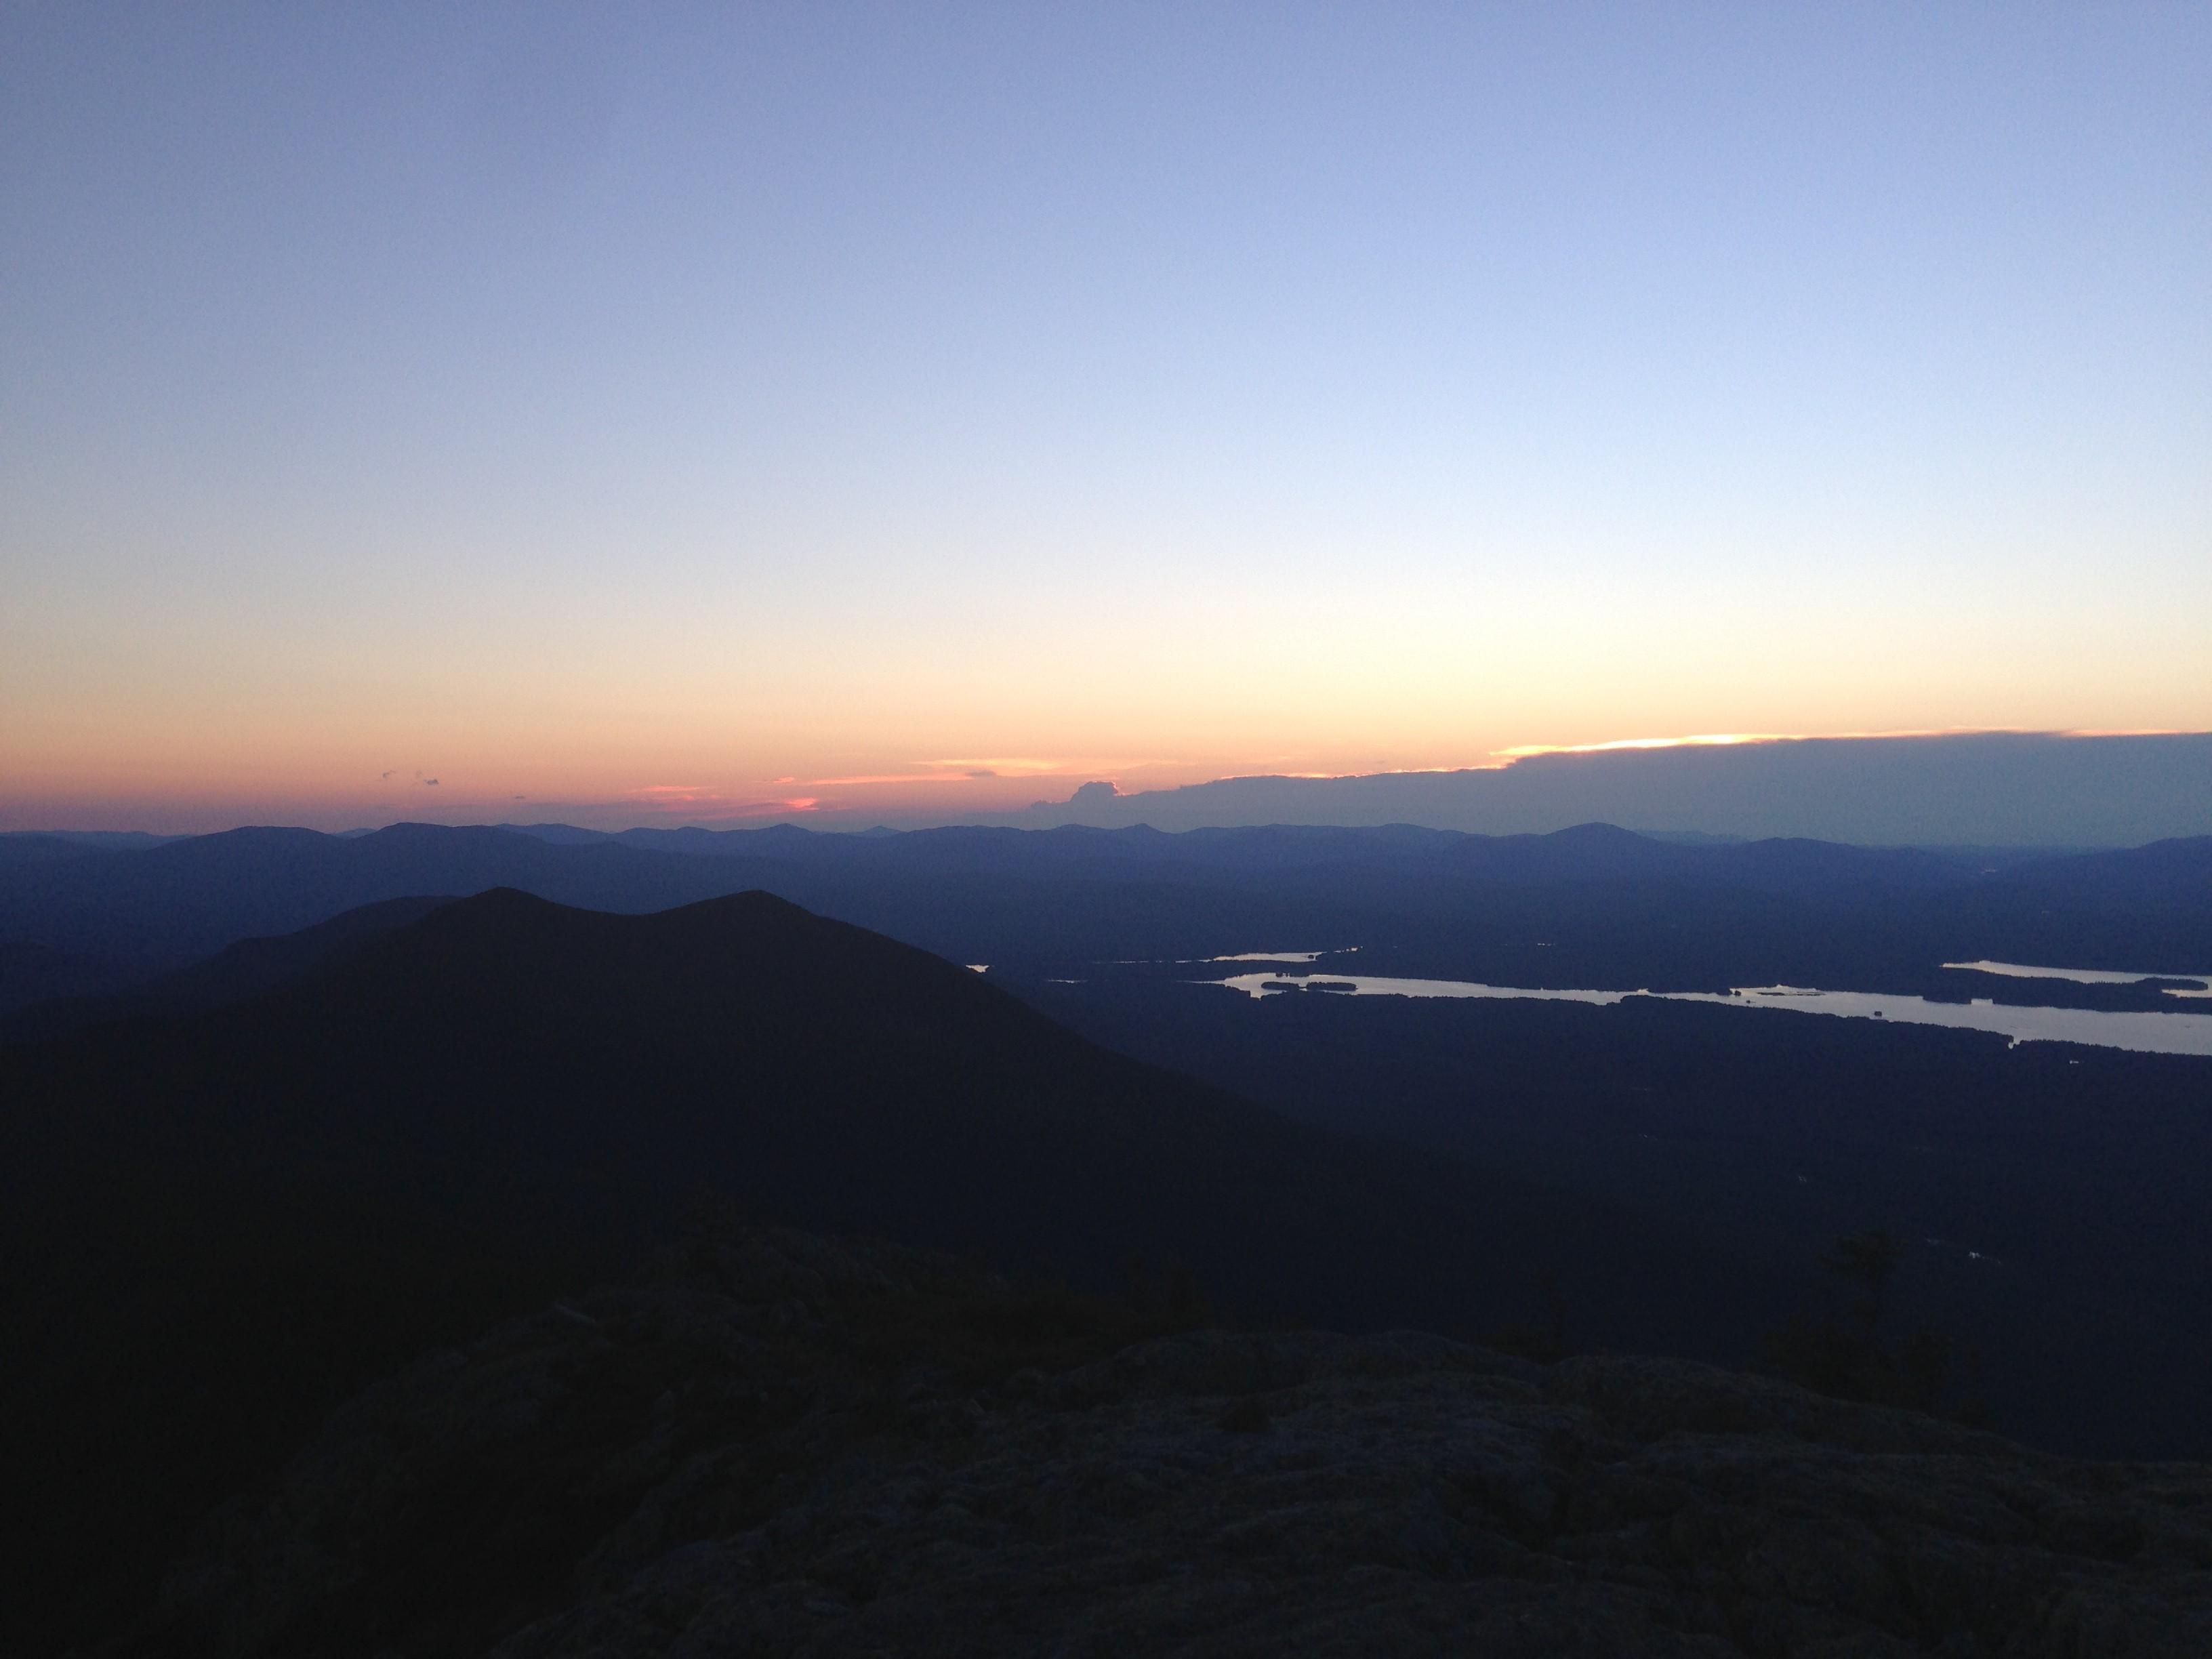 Bigelow West Peak, Sunset Again